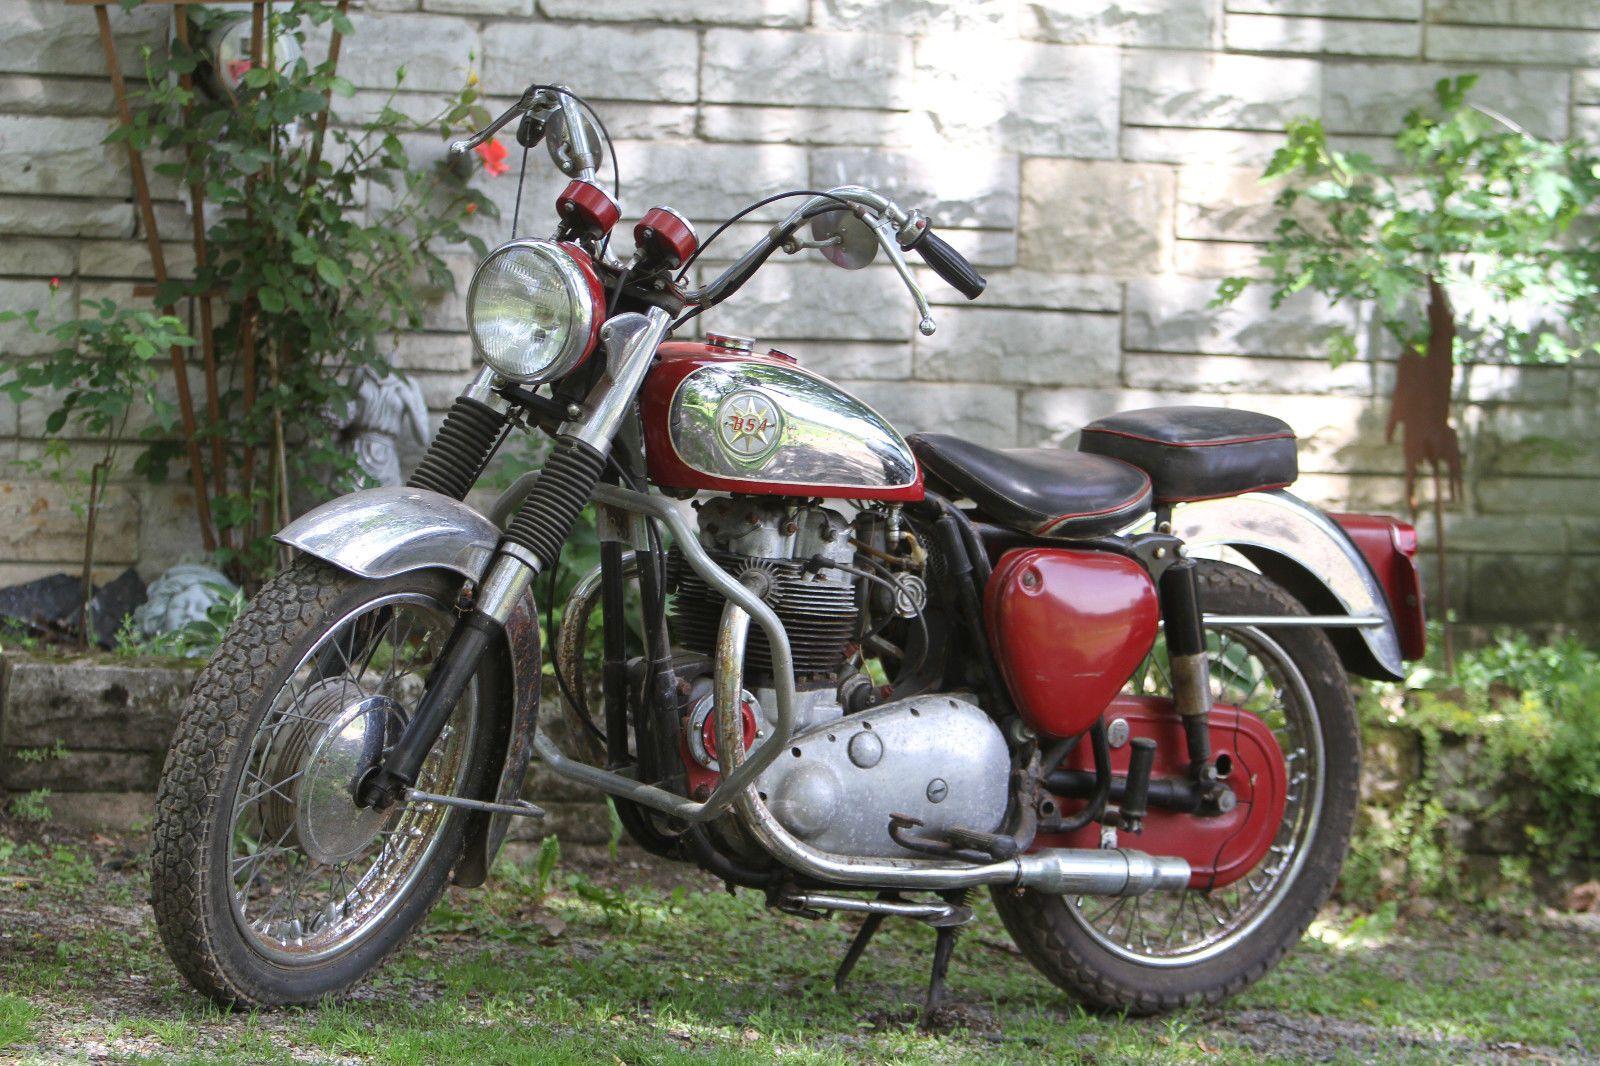 EBay 1963 BSA Super Rocket Classic British Motorcycle Barn Find